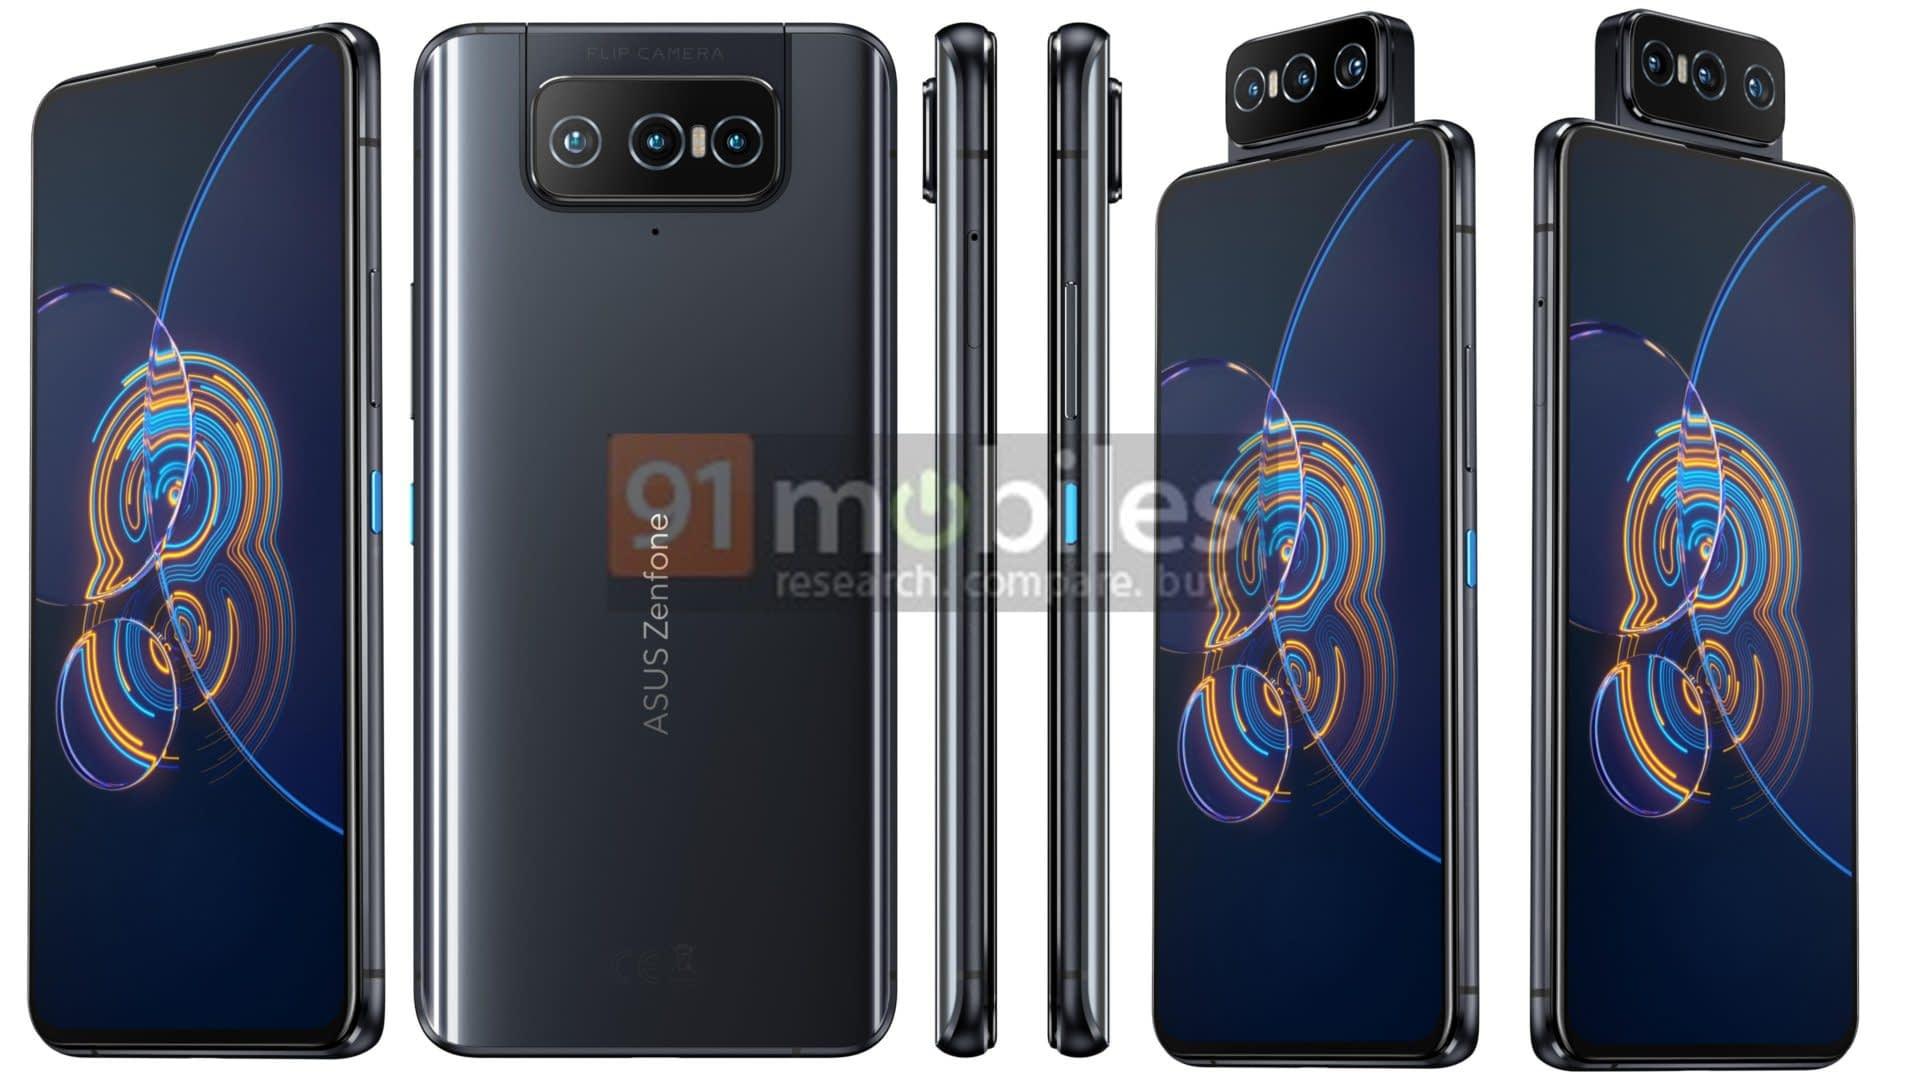 ASUS Zenfone 8 Flip leaked render in Black